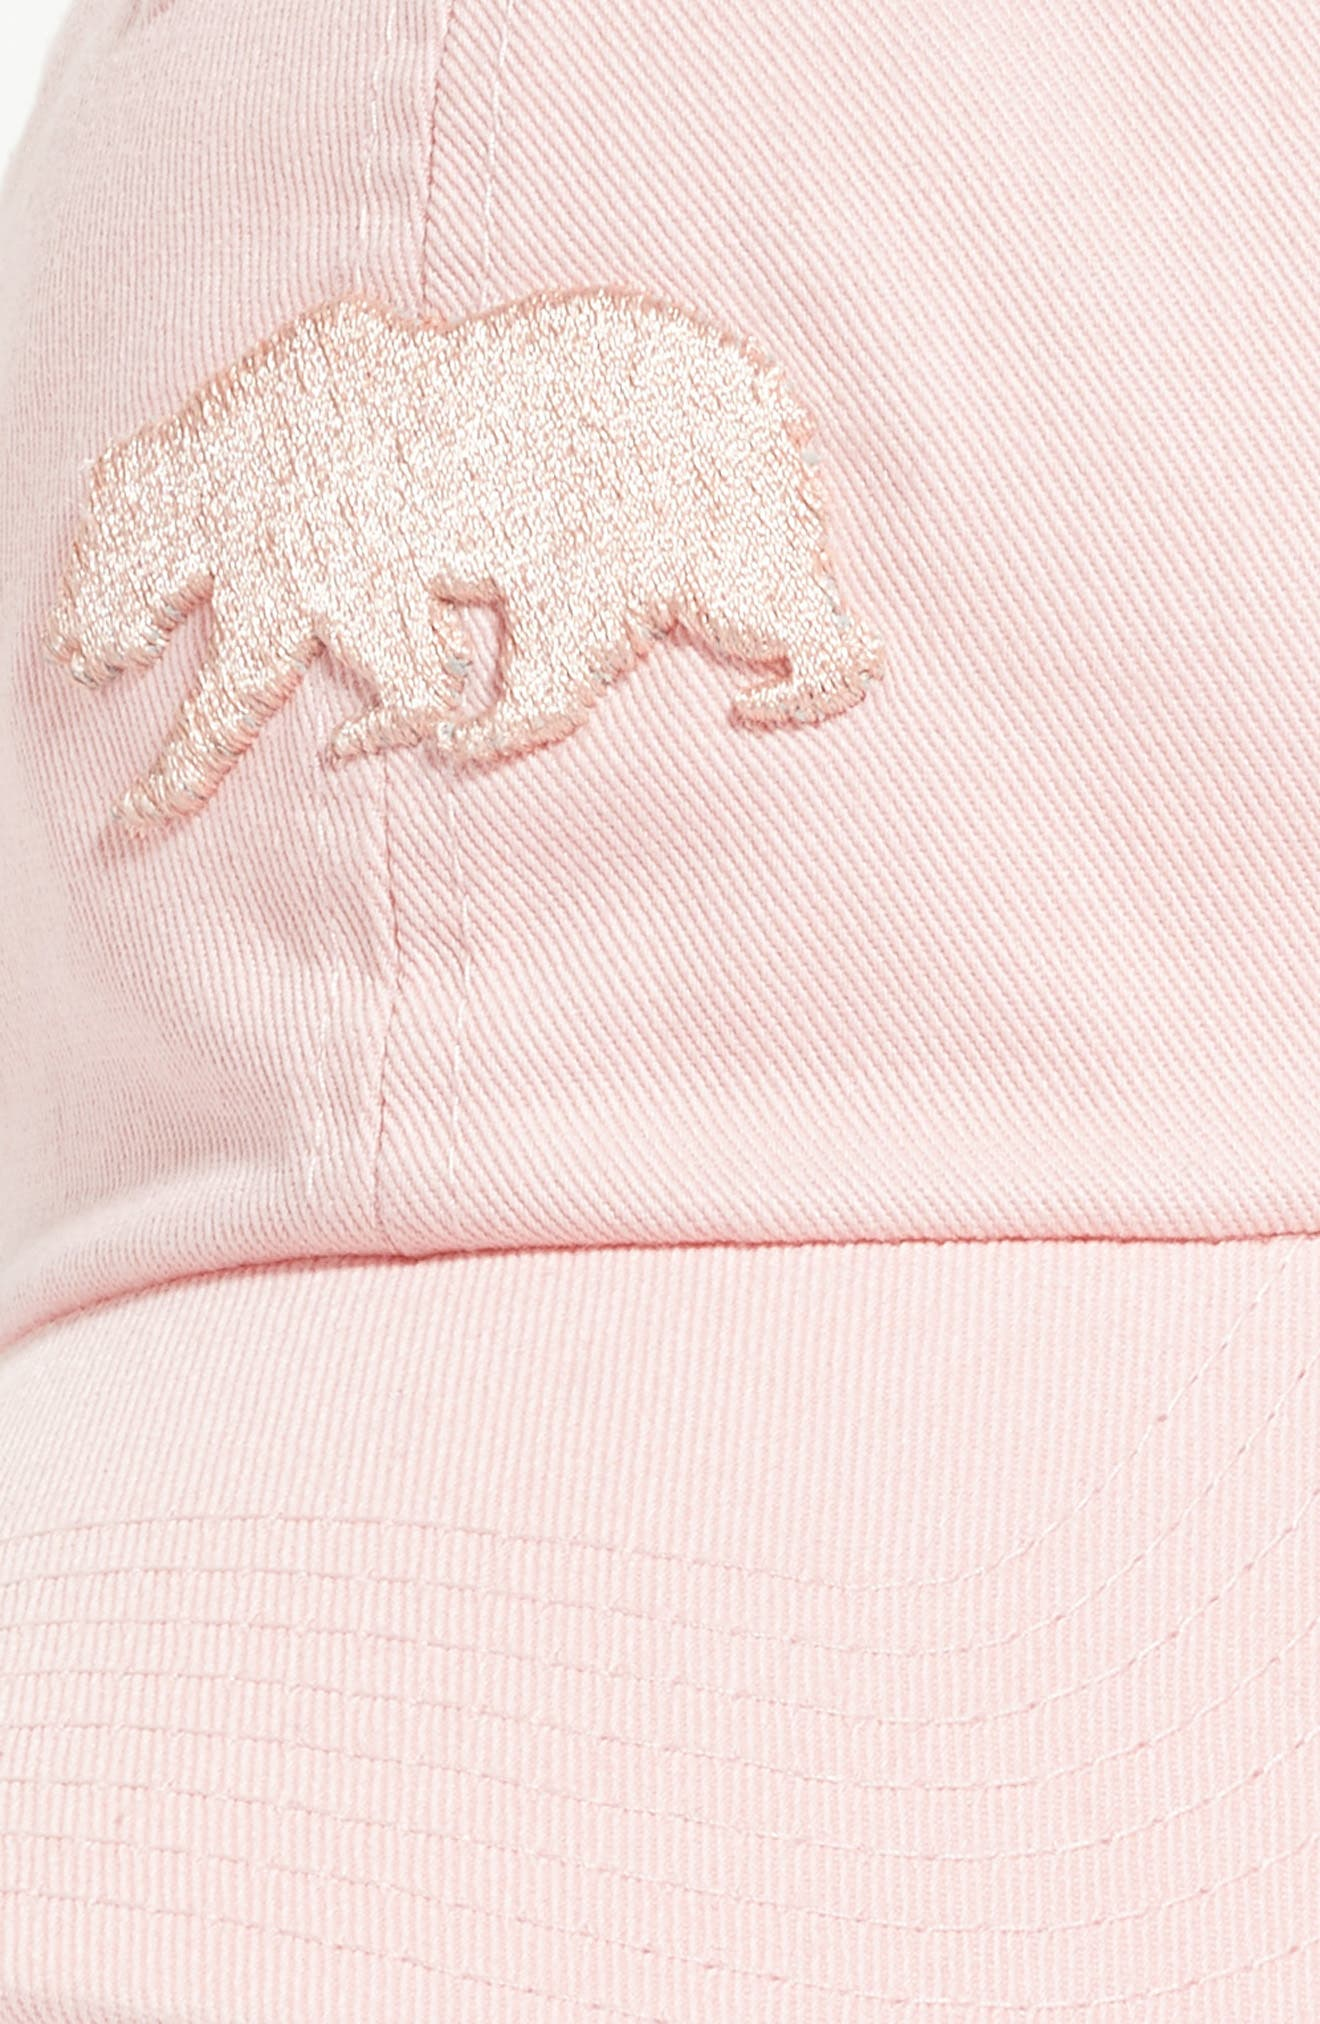 Cali Baseball Cap,                             Alternate thumbnail 2, color,                             Club Pink